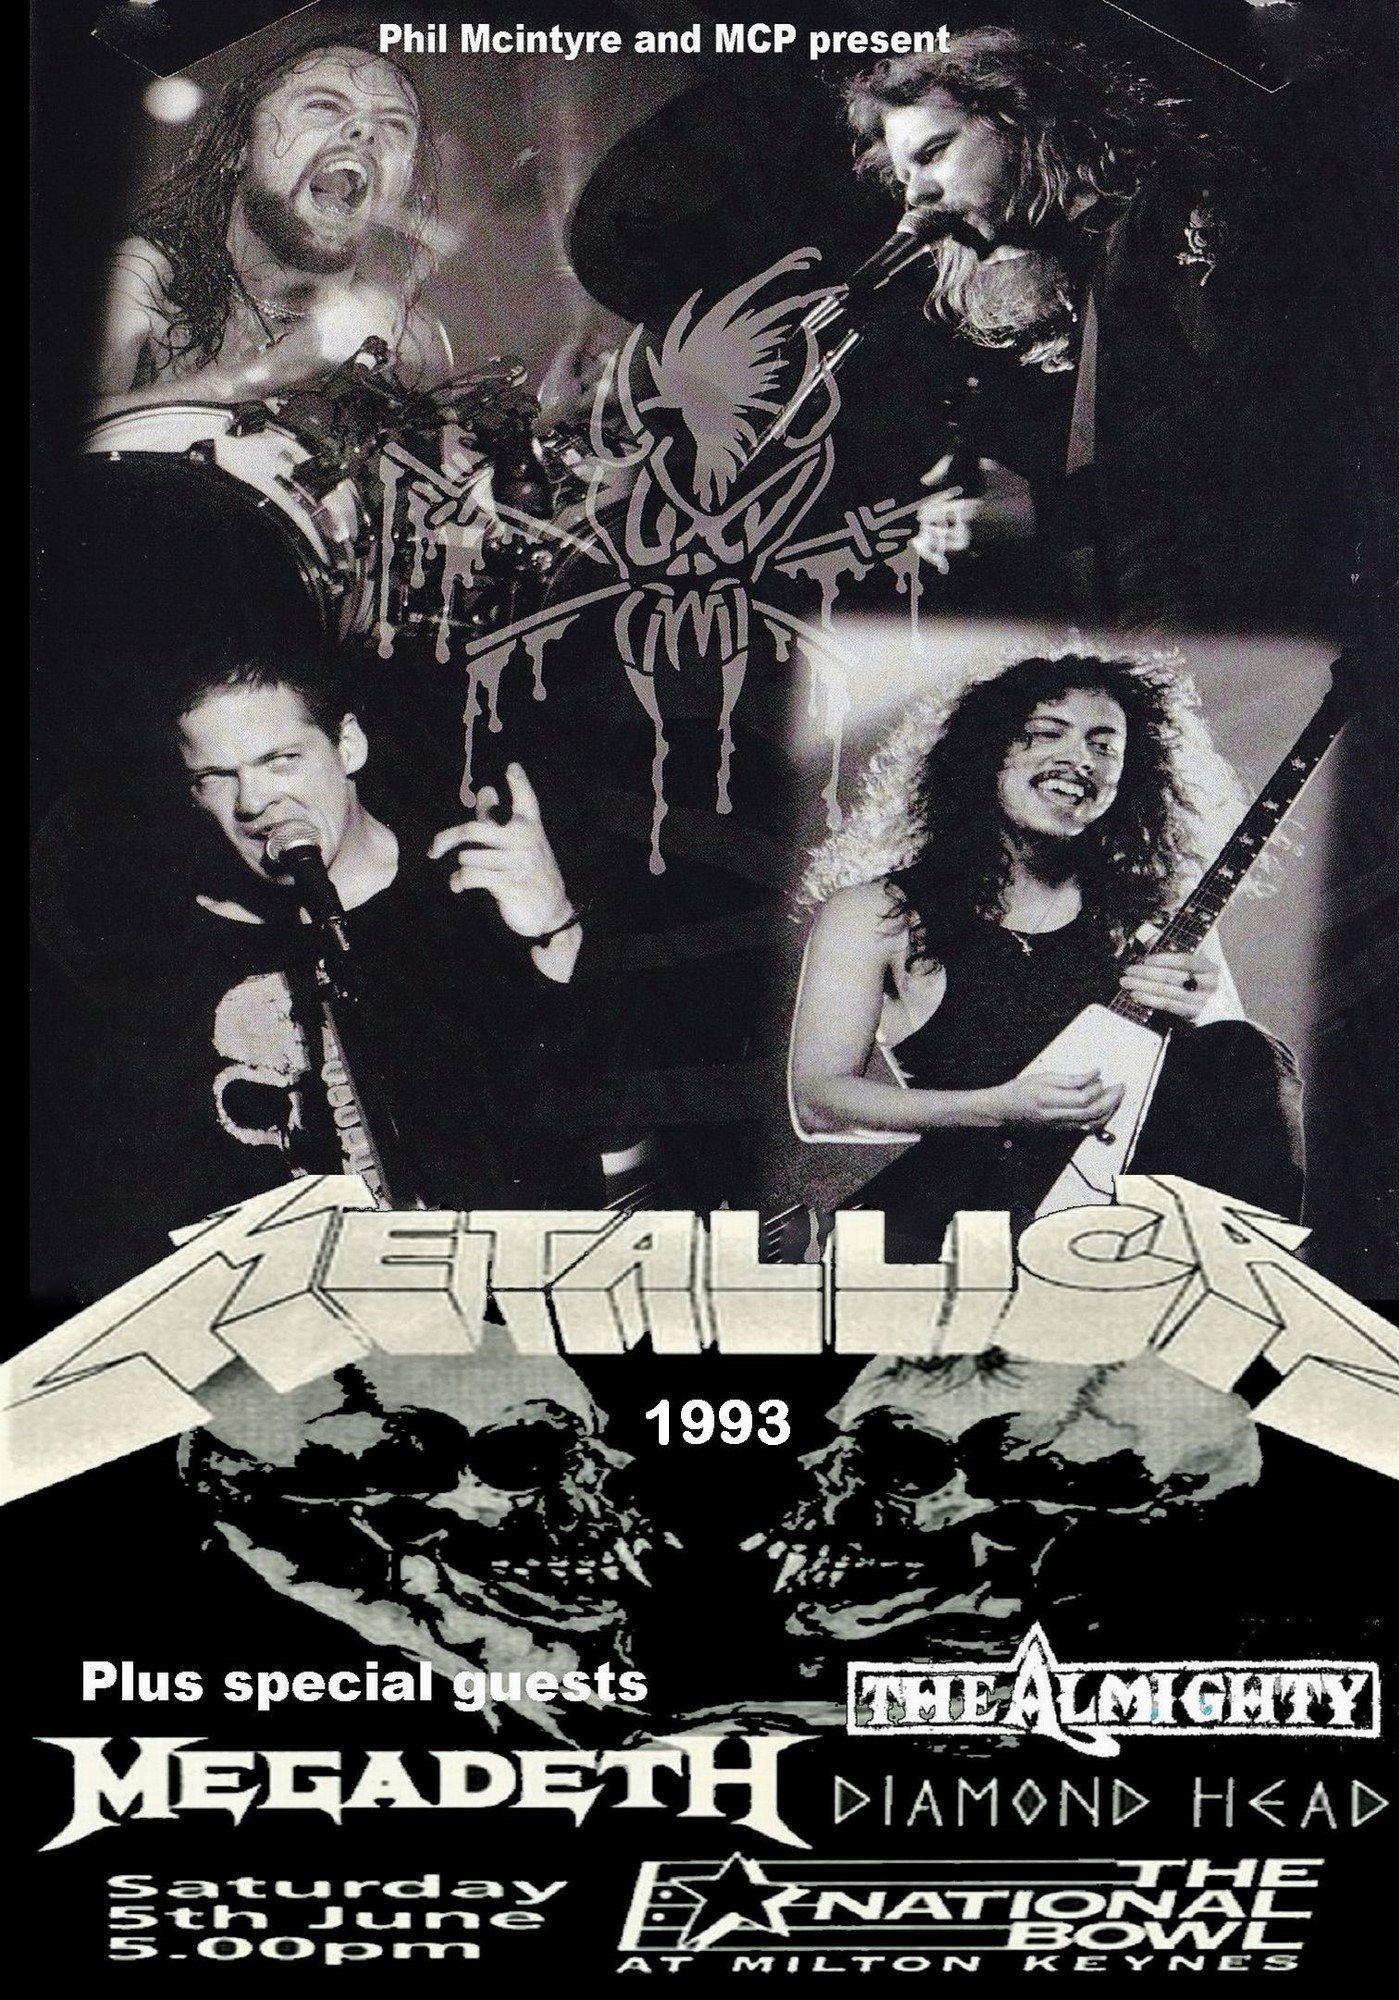 Metallica Vintage Poster Milton Keynes Bowl Uk 1993 Concert Posters Metallica Concert Metallica Vintage